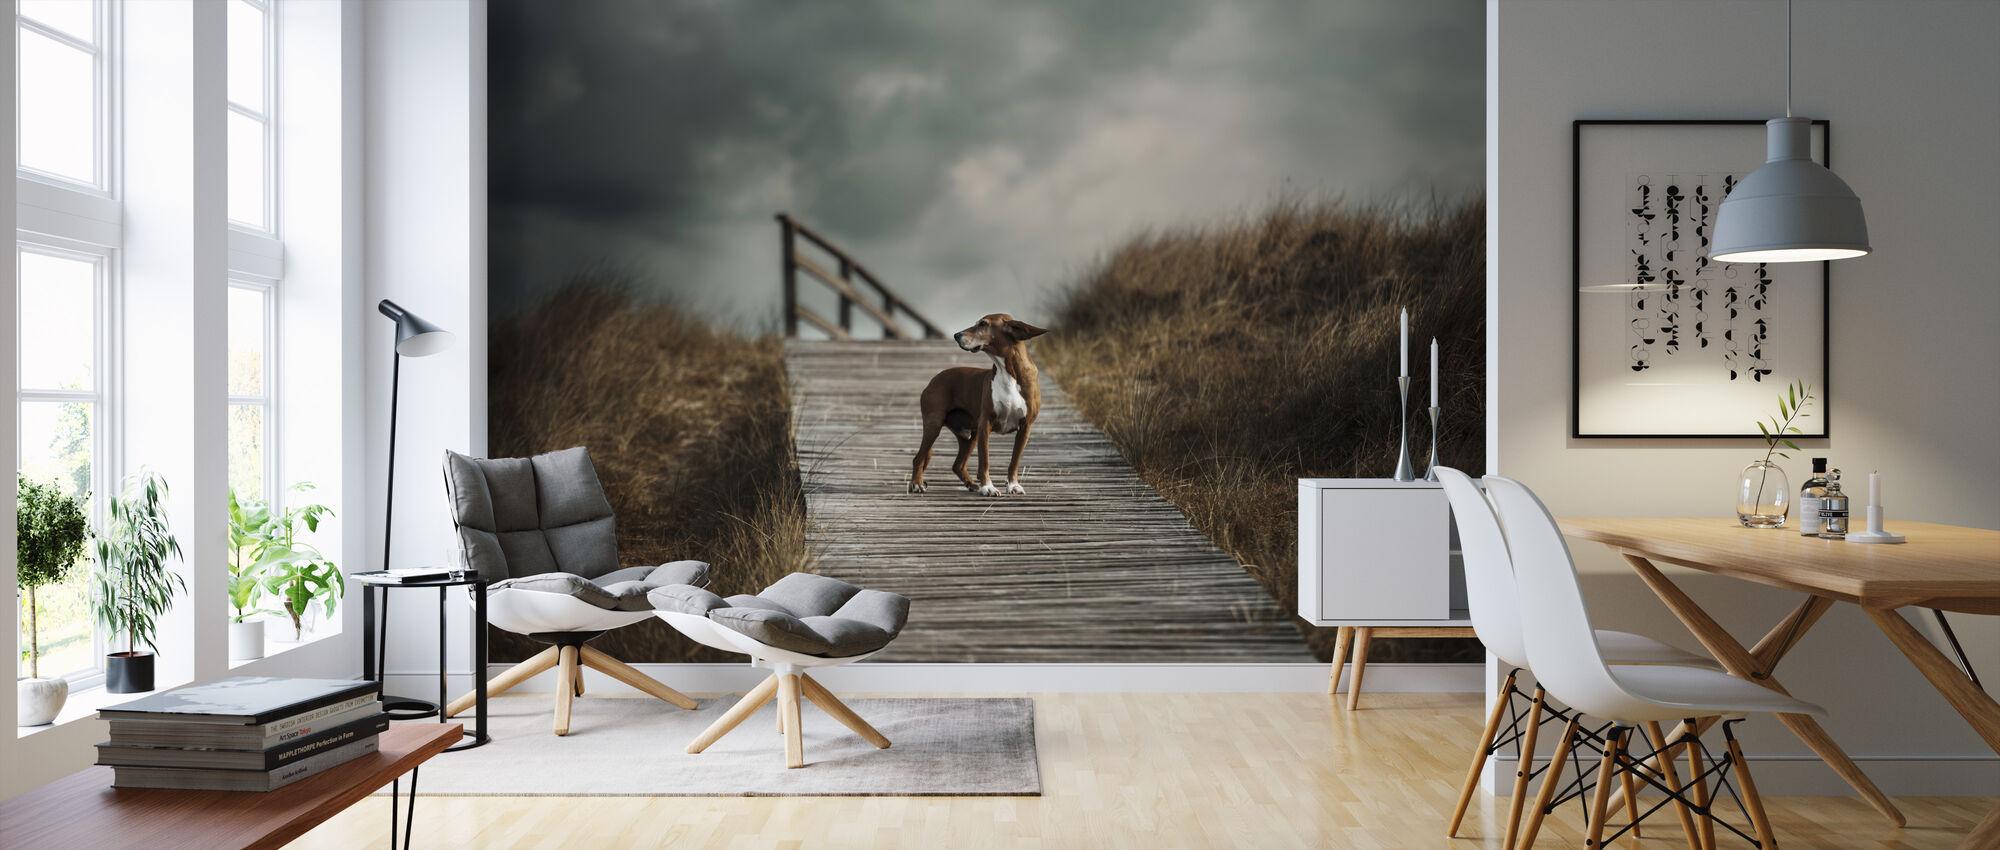 Dog on Boardwalk - Wallpaper - Living Room